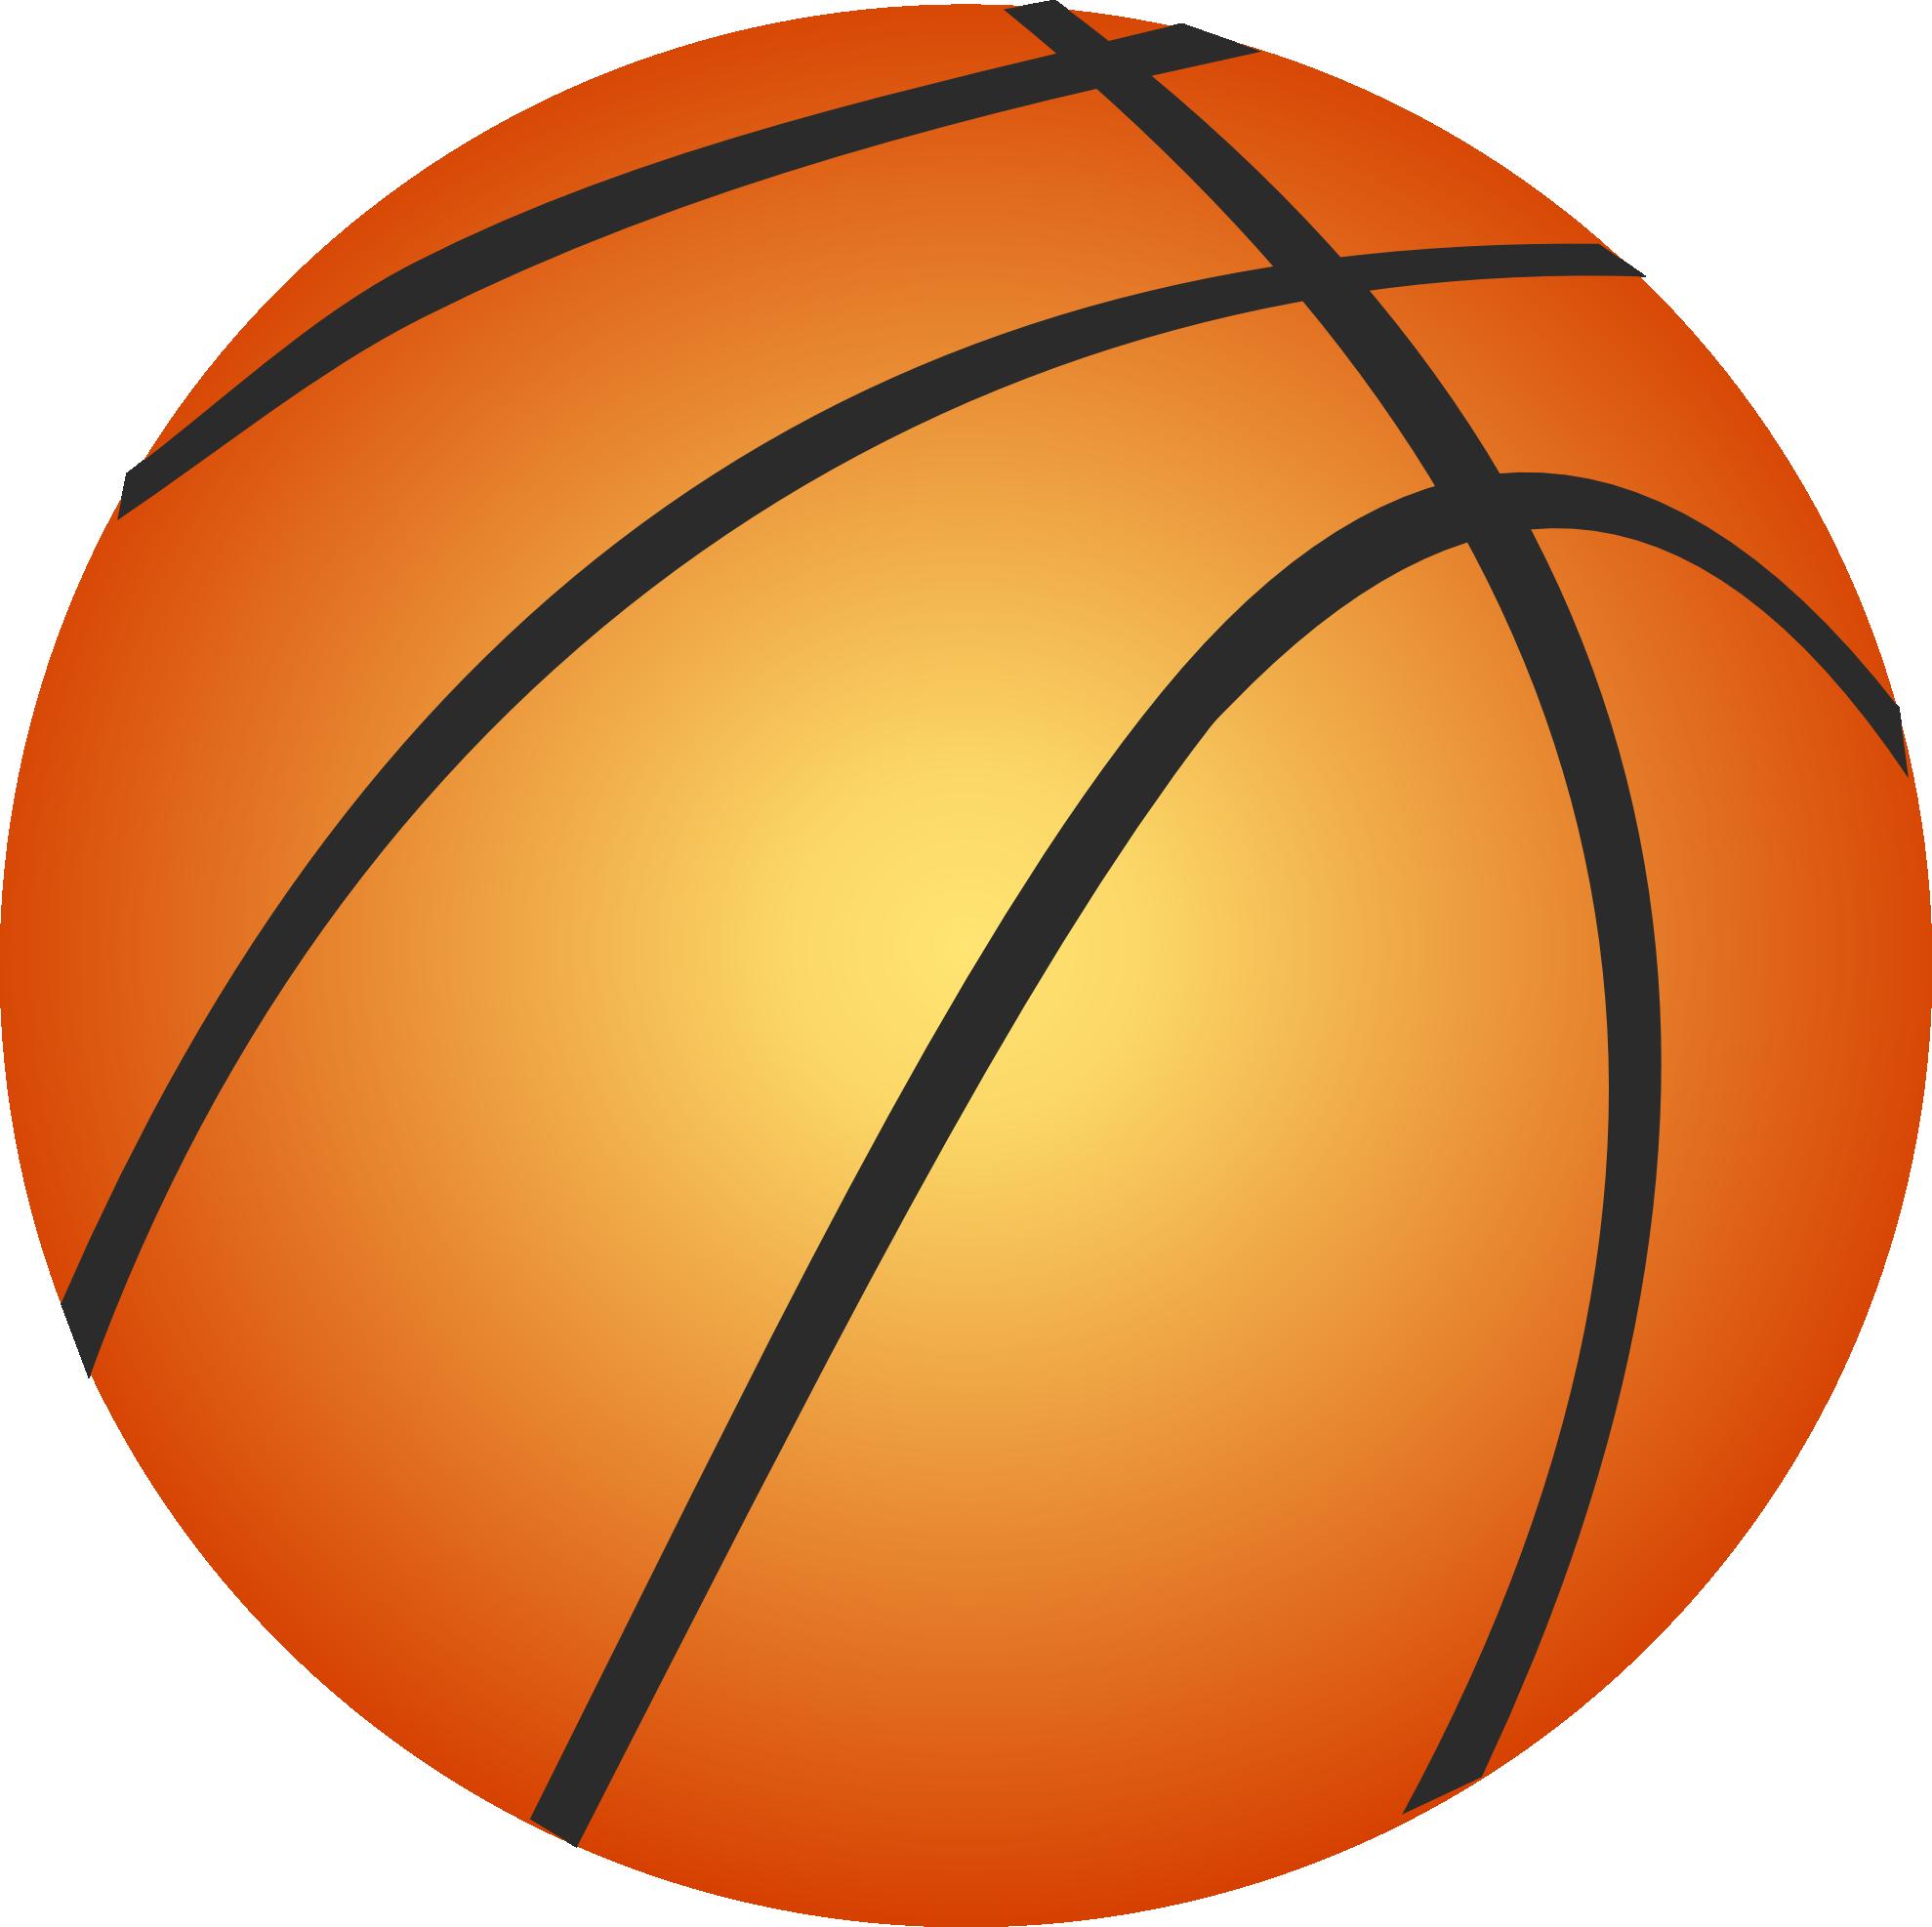 20 basketball clipart free clipartlook rh clipartlook com Basketball Clip Art Free Printable Free Basketball Clip Art Borders